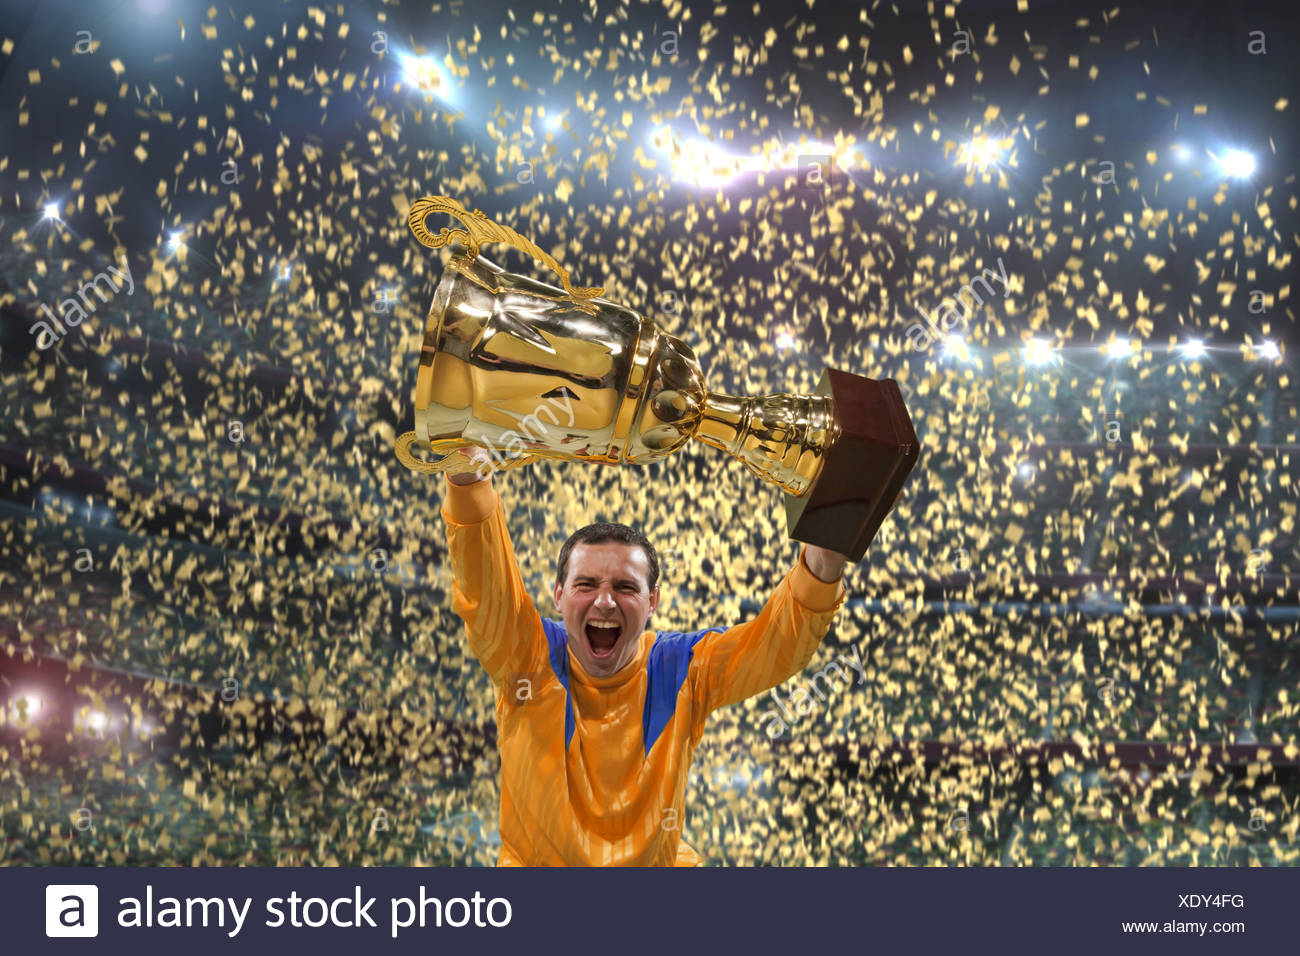 Football player holding up trophy, cheering, winner, winning, confetti, football stadium - Stock Image